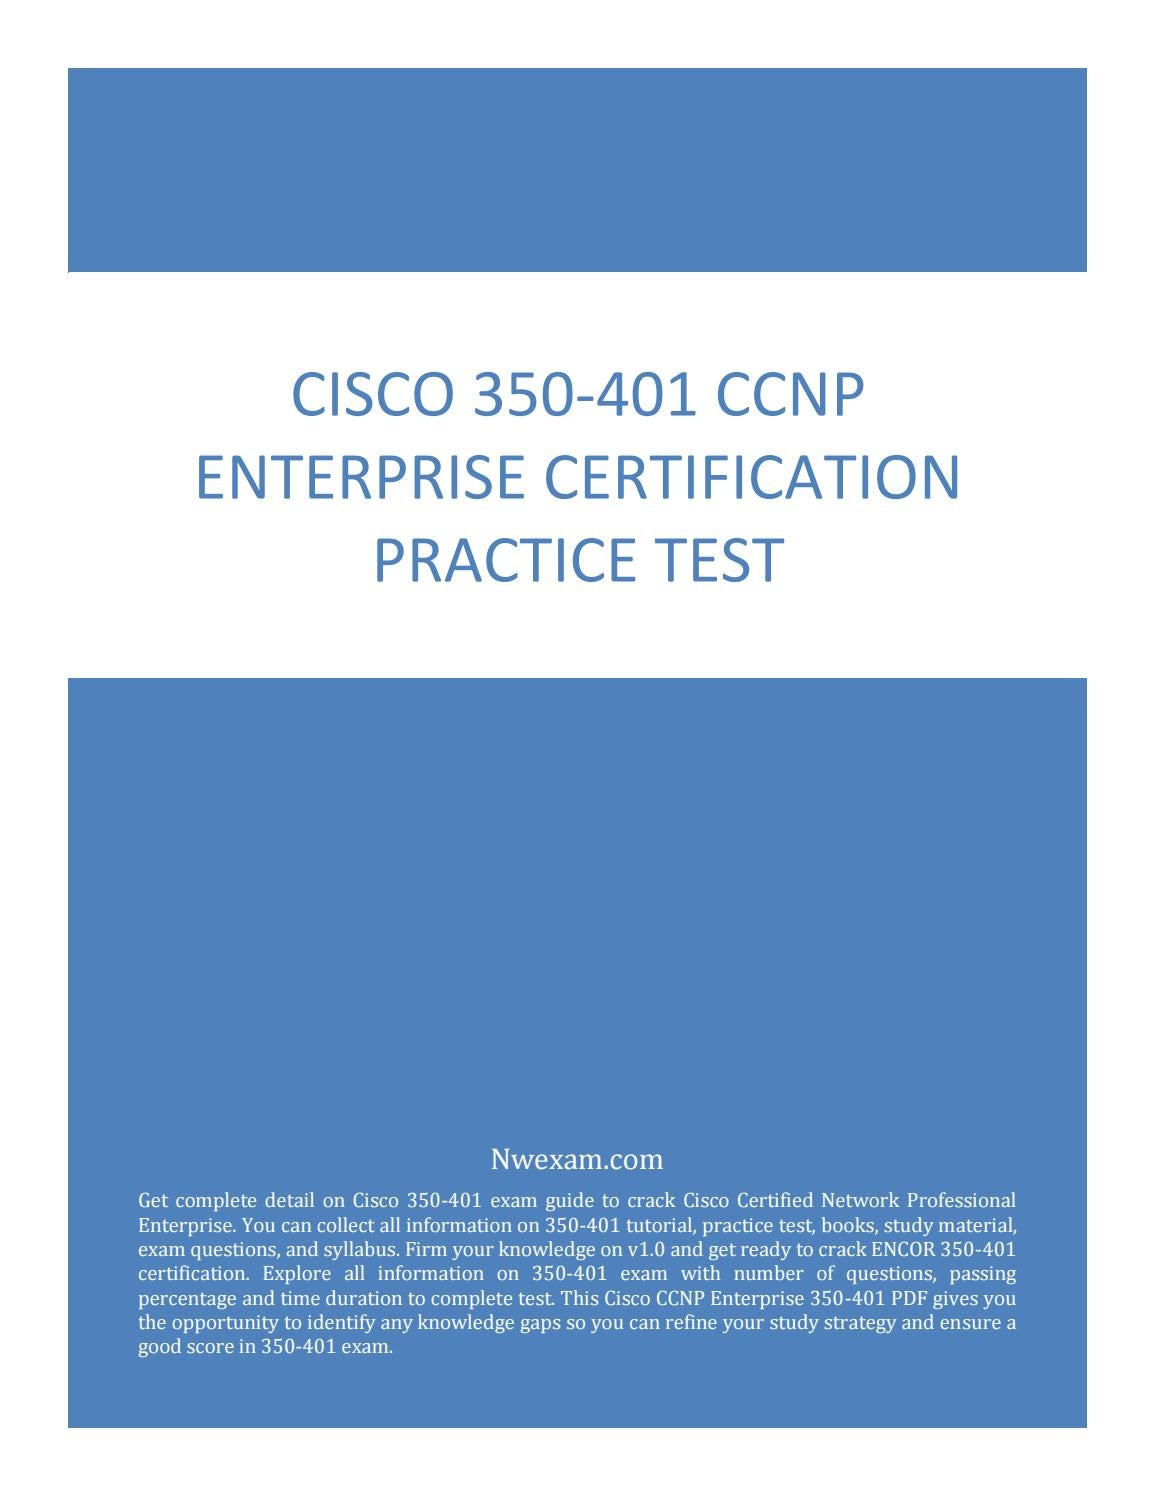 ccnp enterprise cisco certification practice test